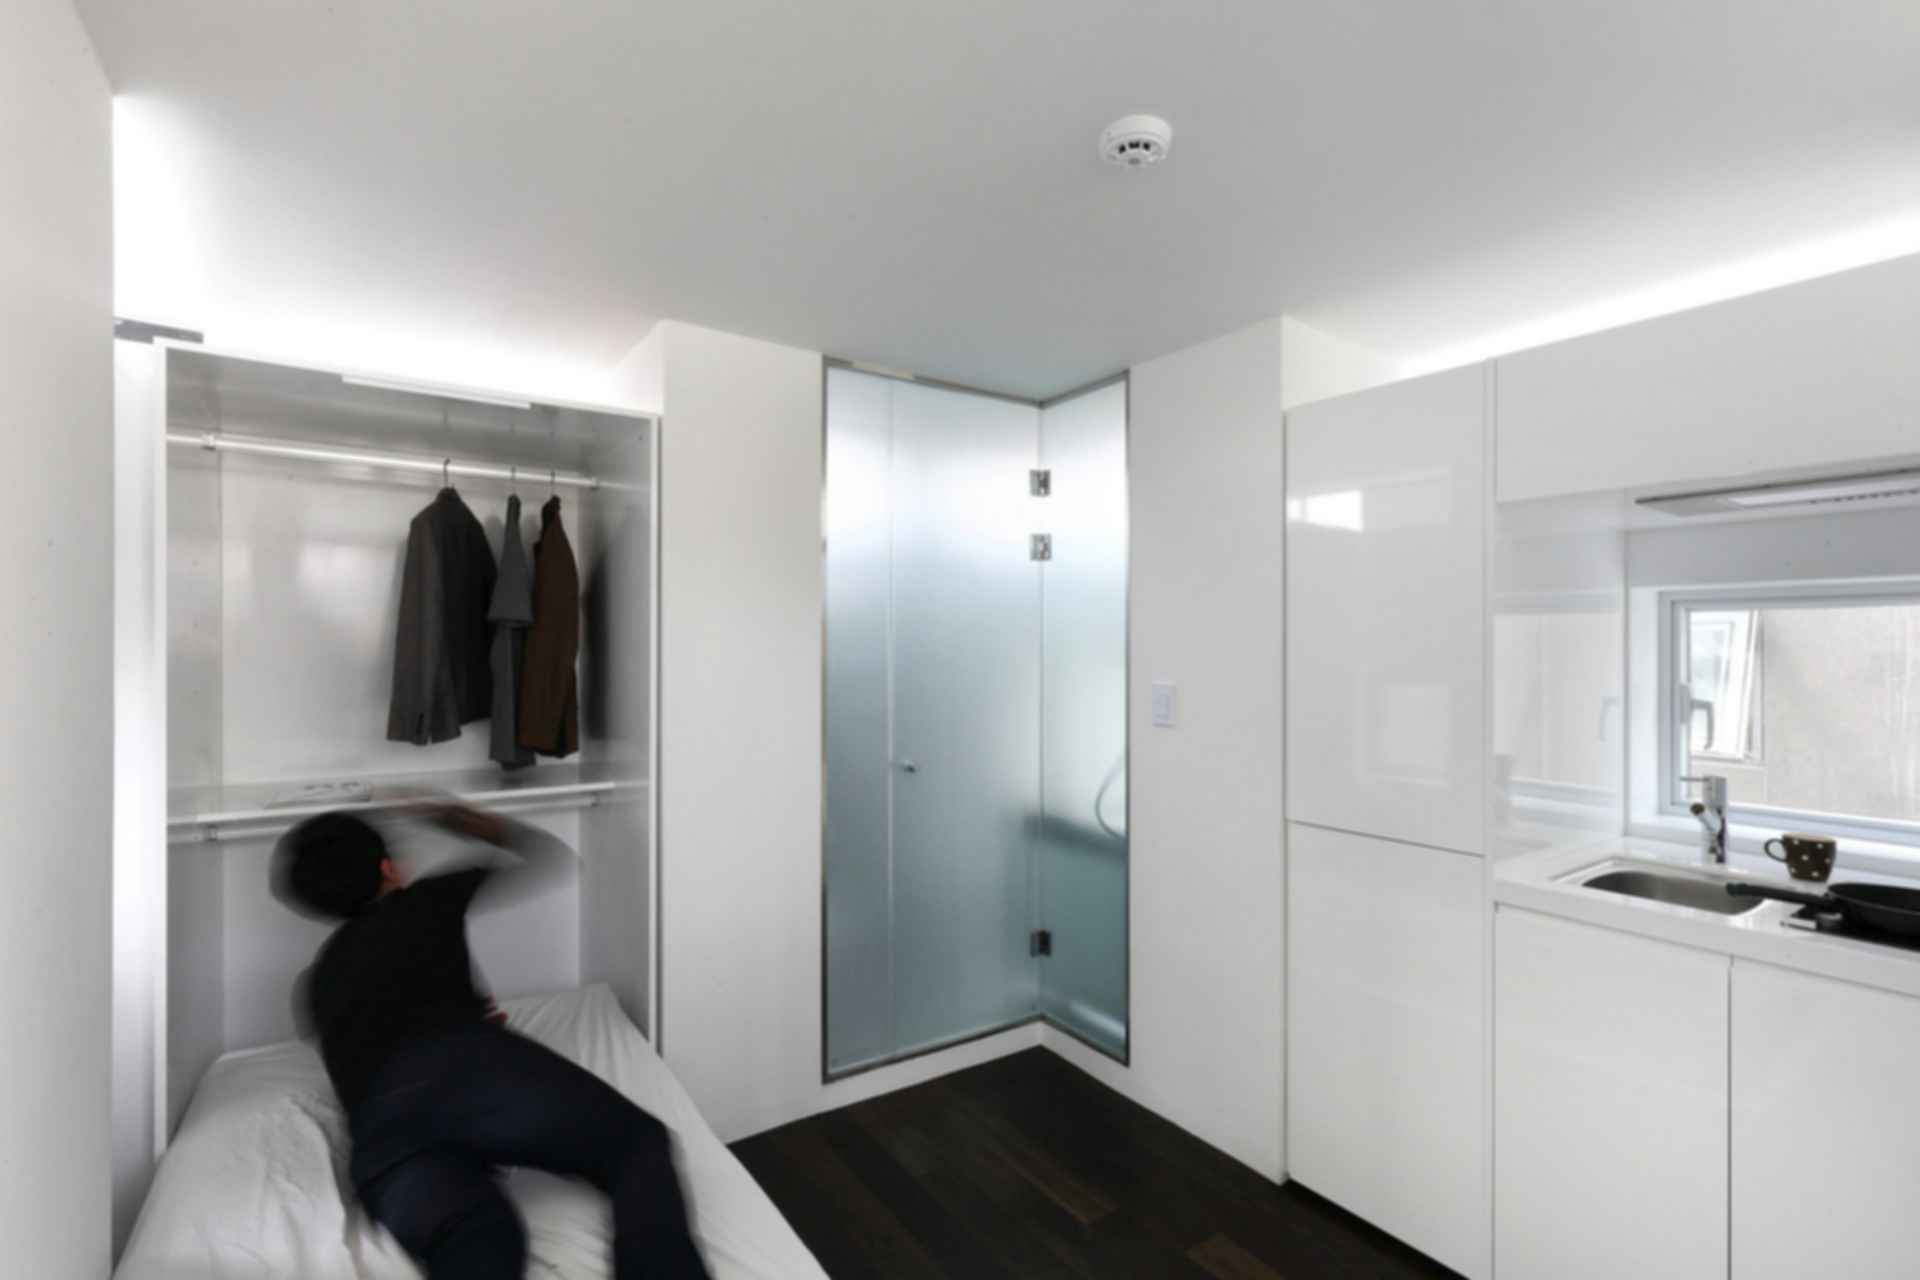 Songpa Micro Housing - Interior